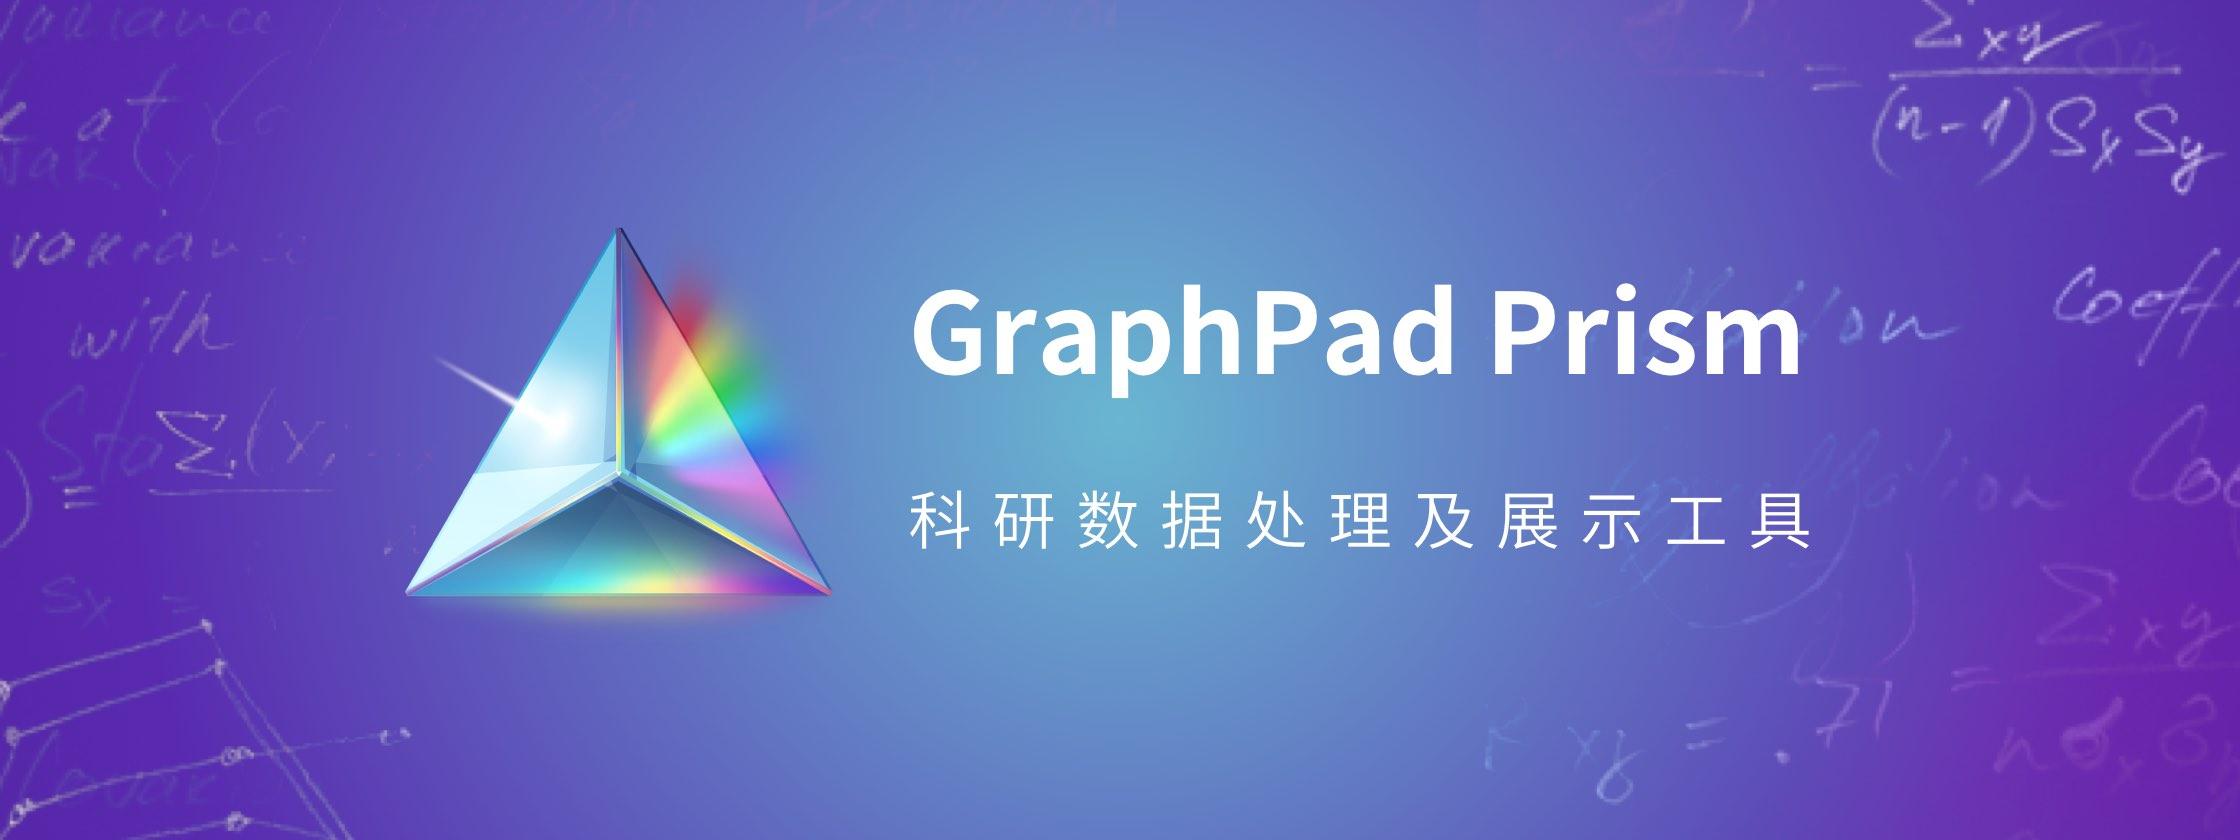 GraphPad Prism:科研数据处理及展示工具